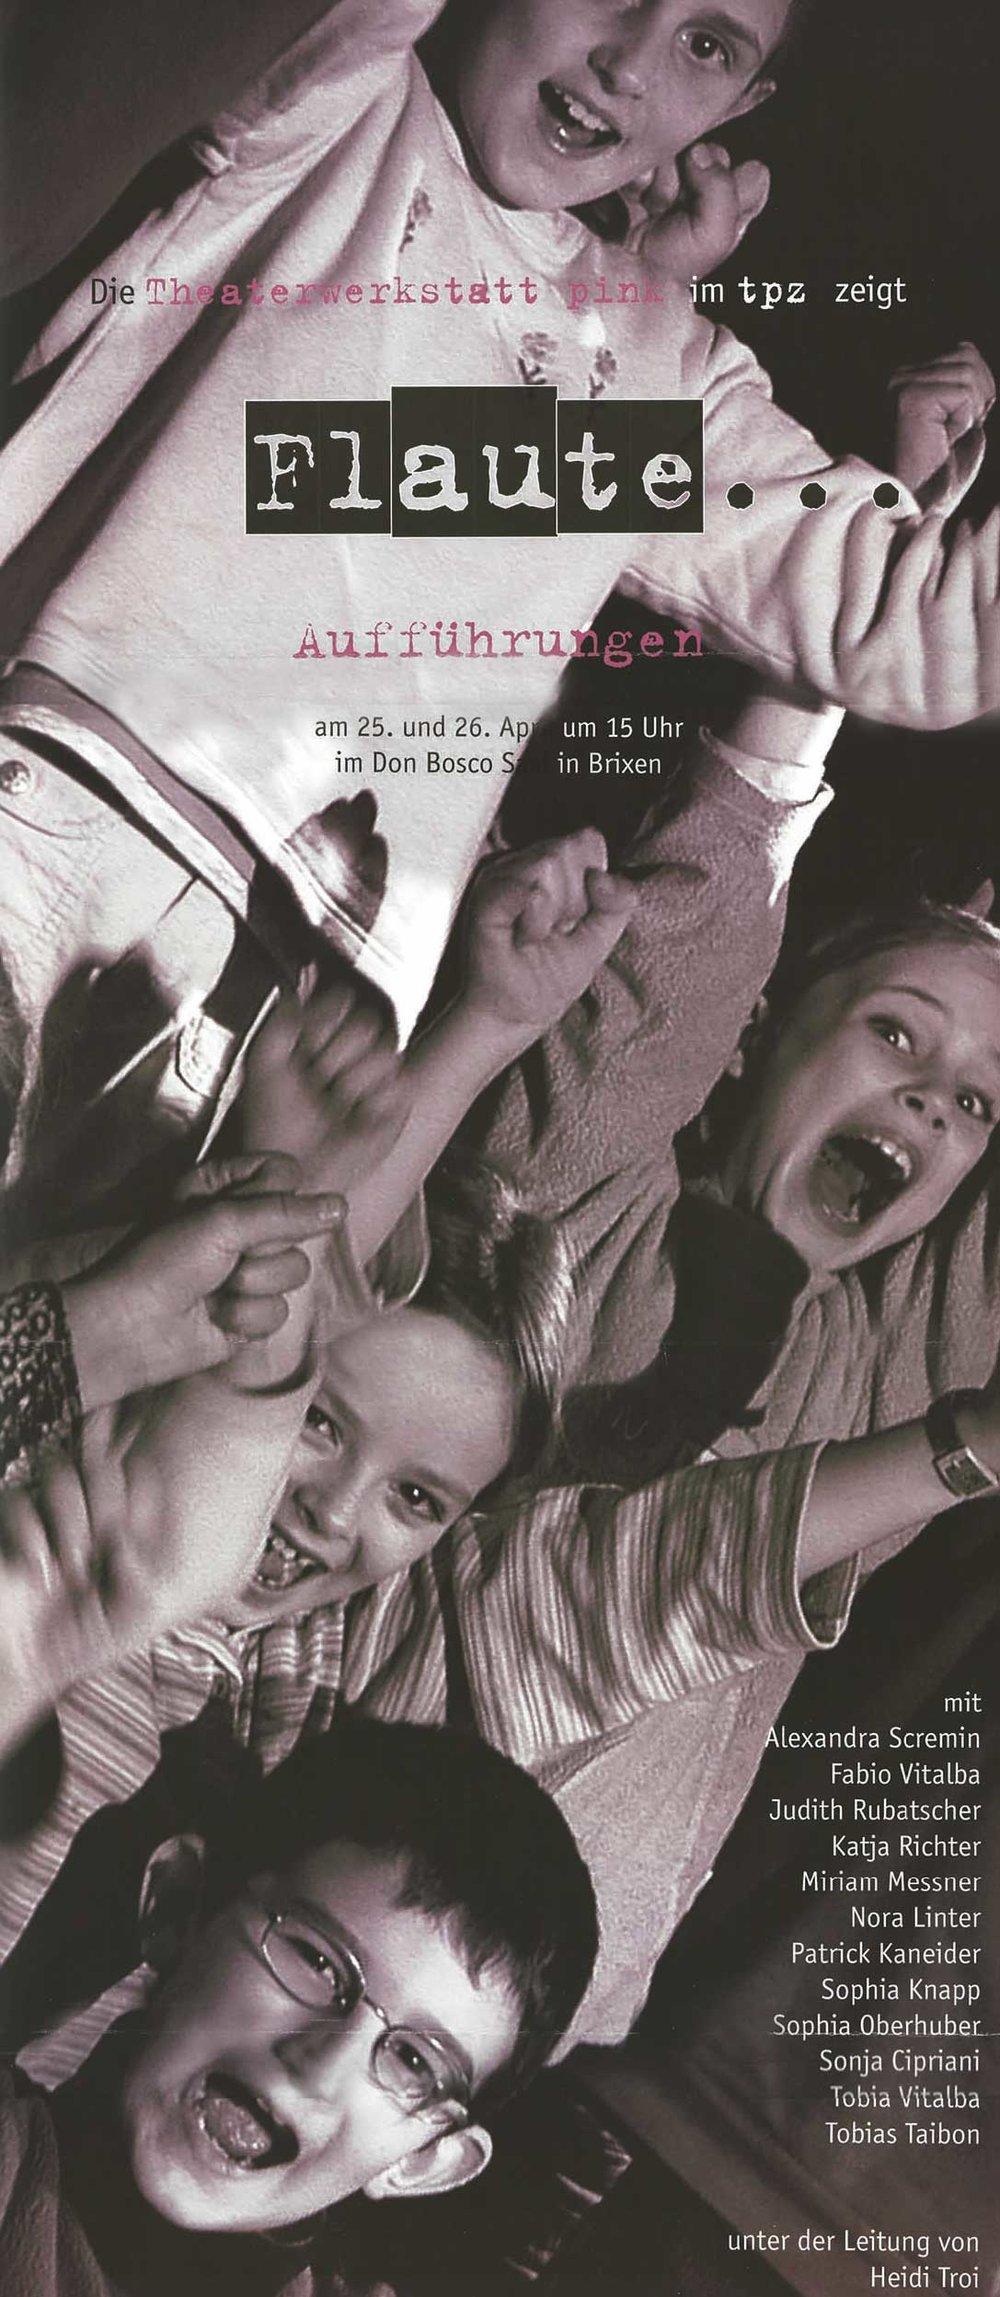 2004-pink-Flaute-Plakat-web.jpg